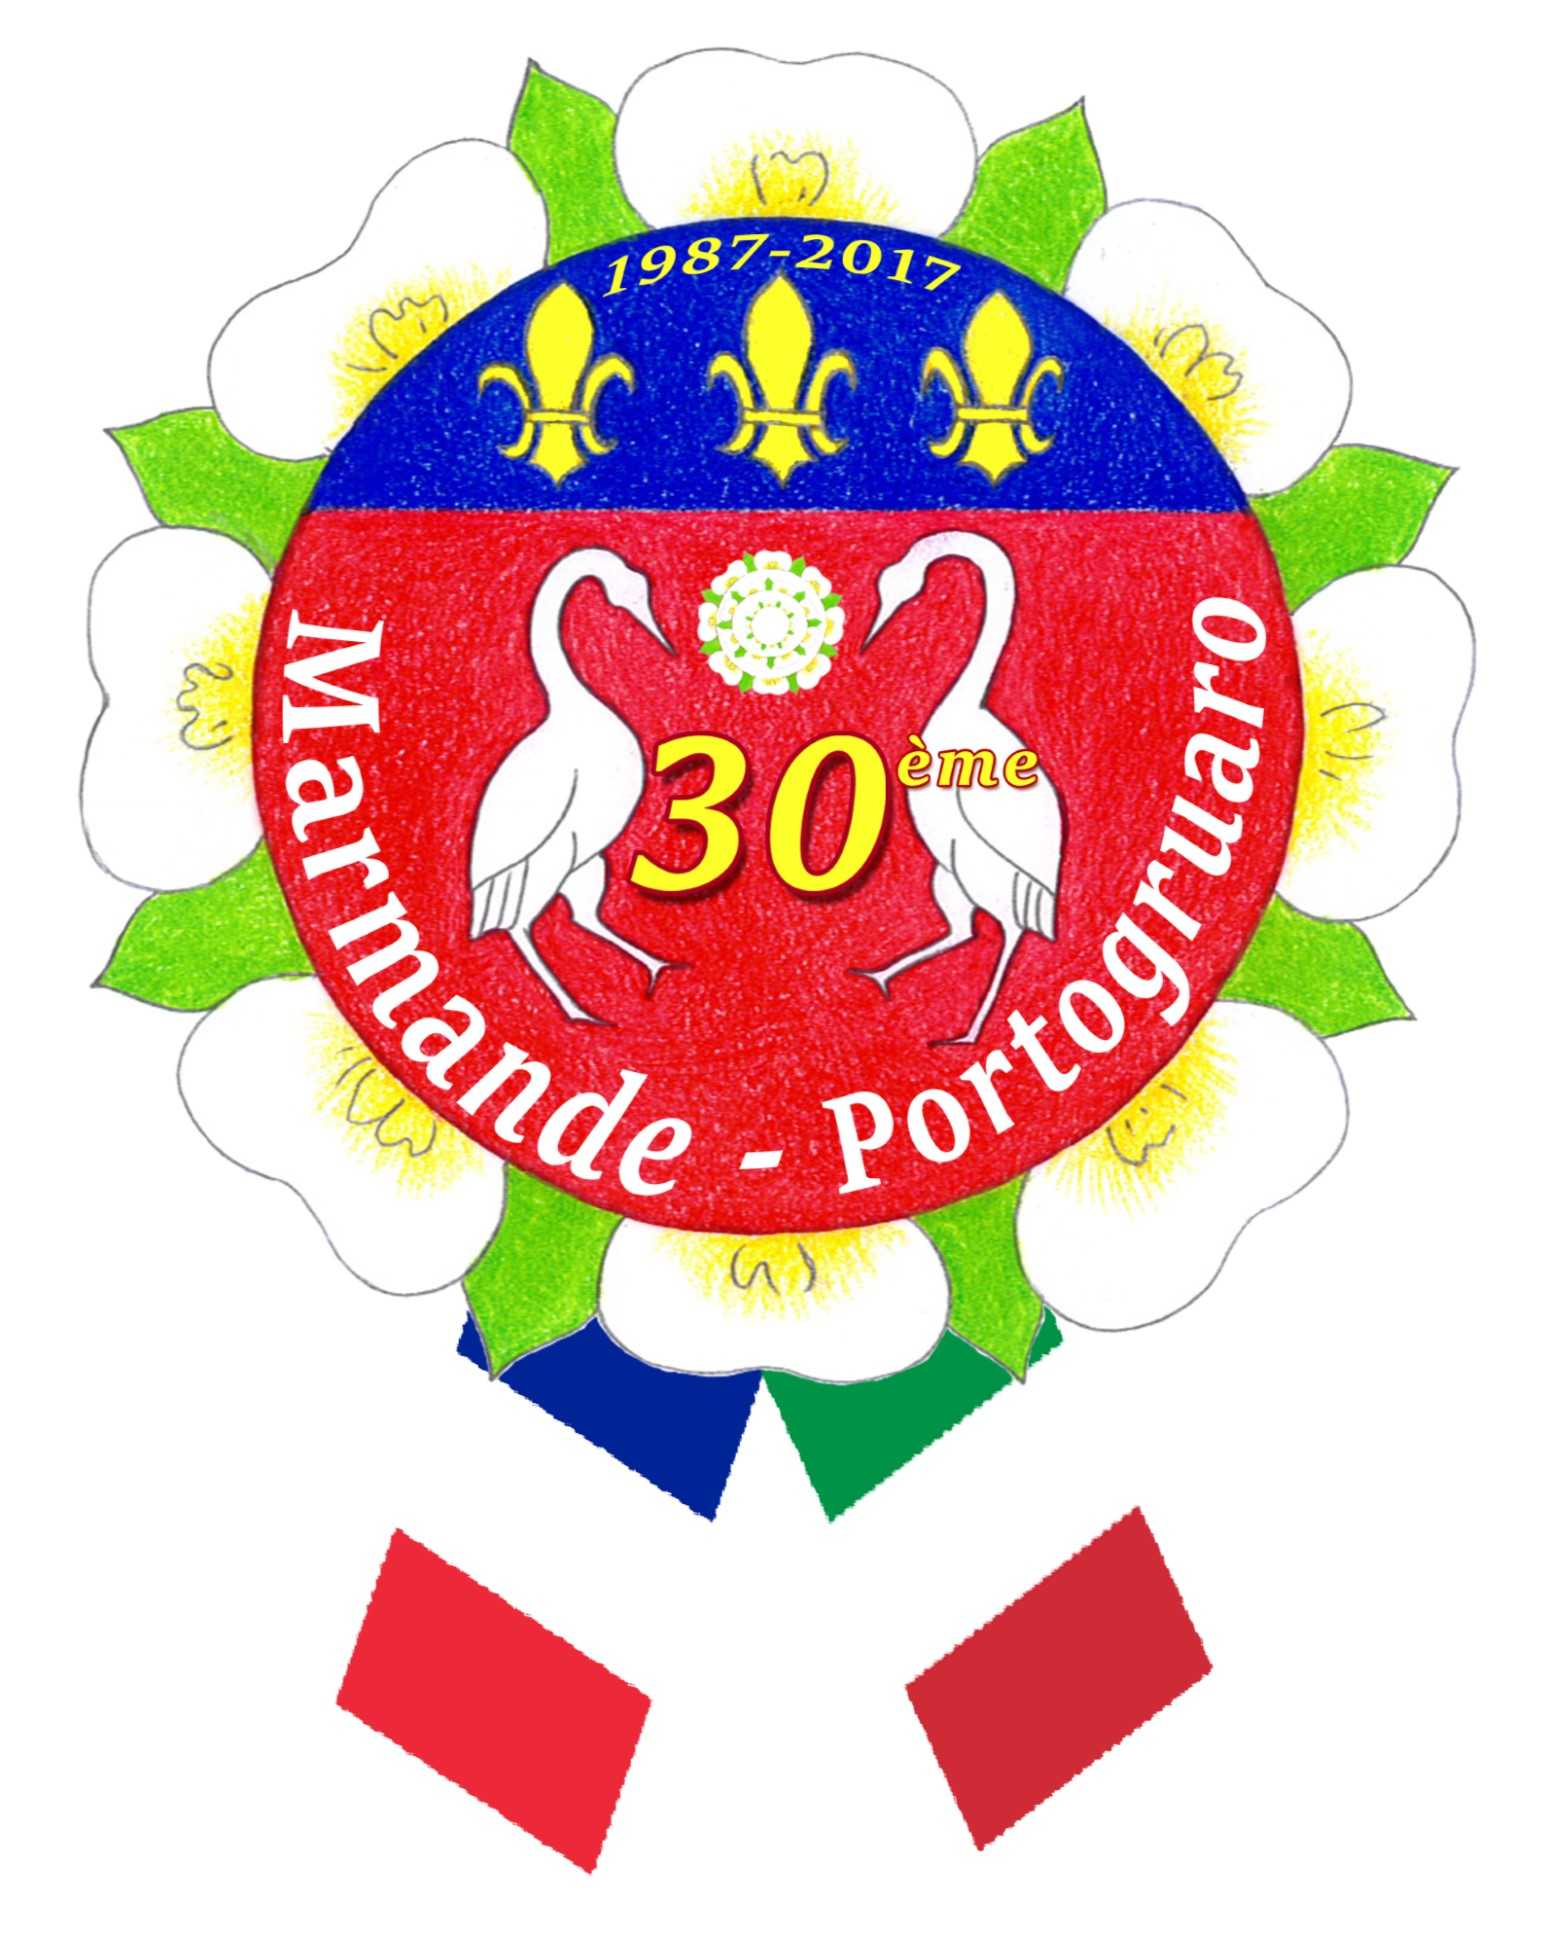 Gemellaggio Portogruaro - Marmande